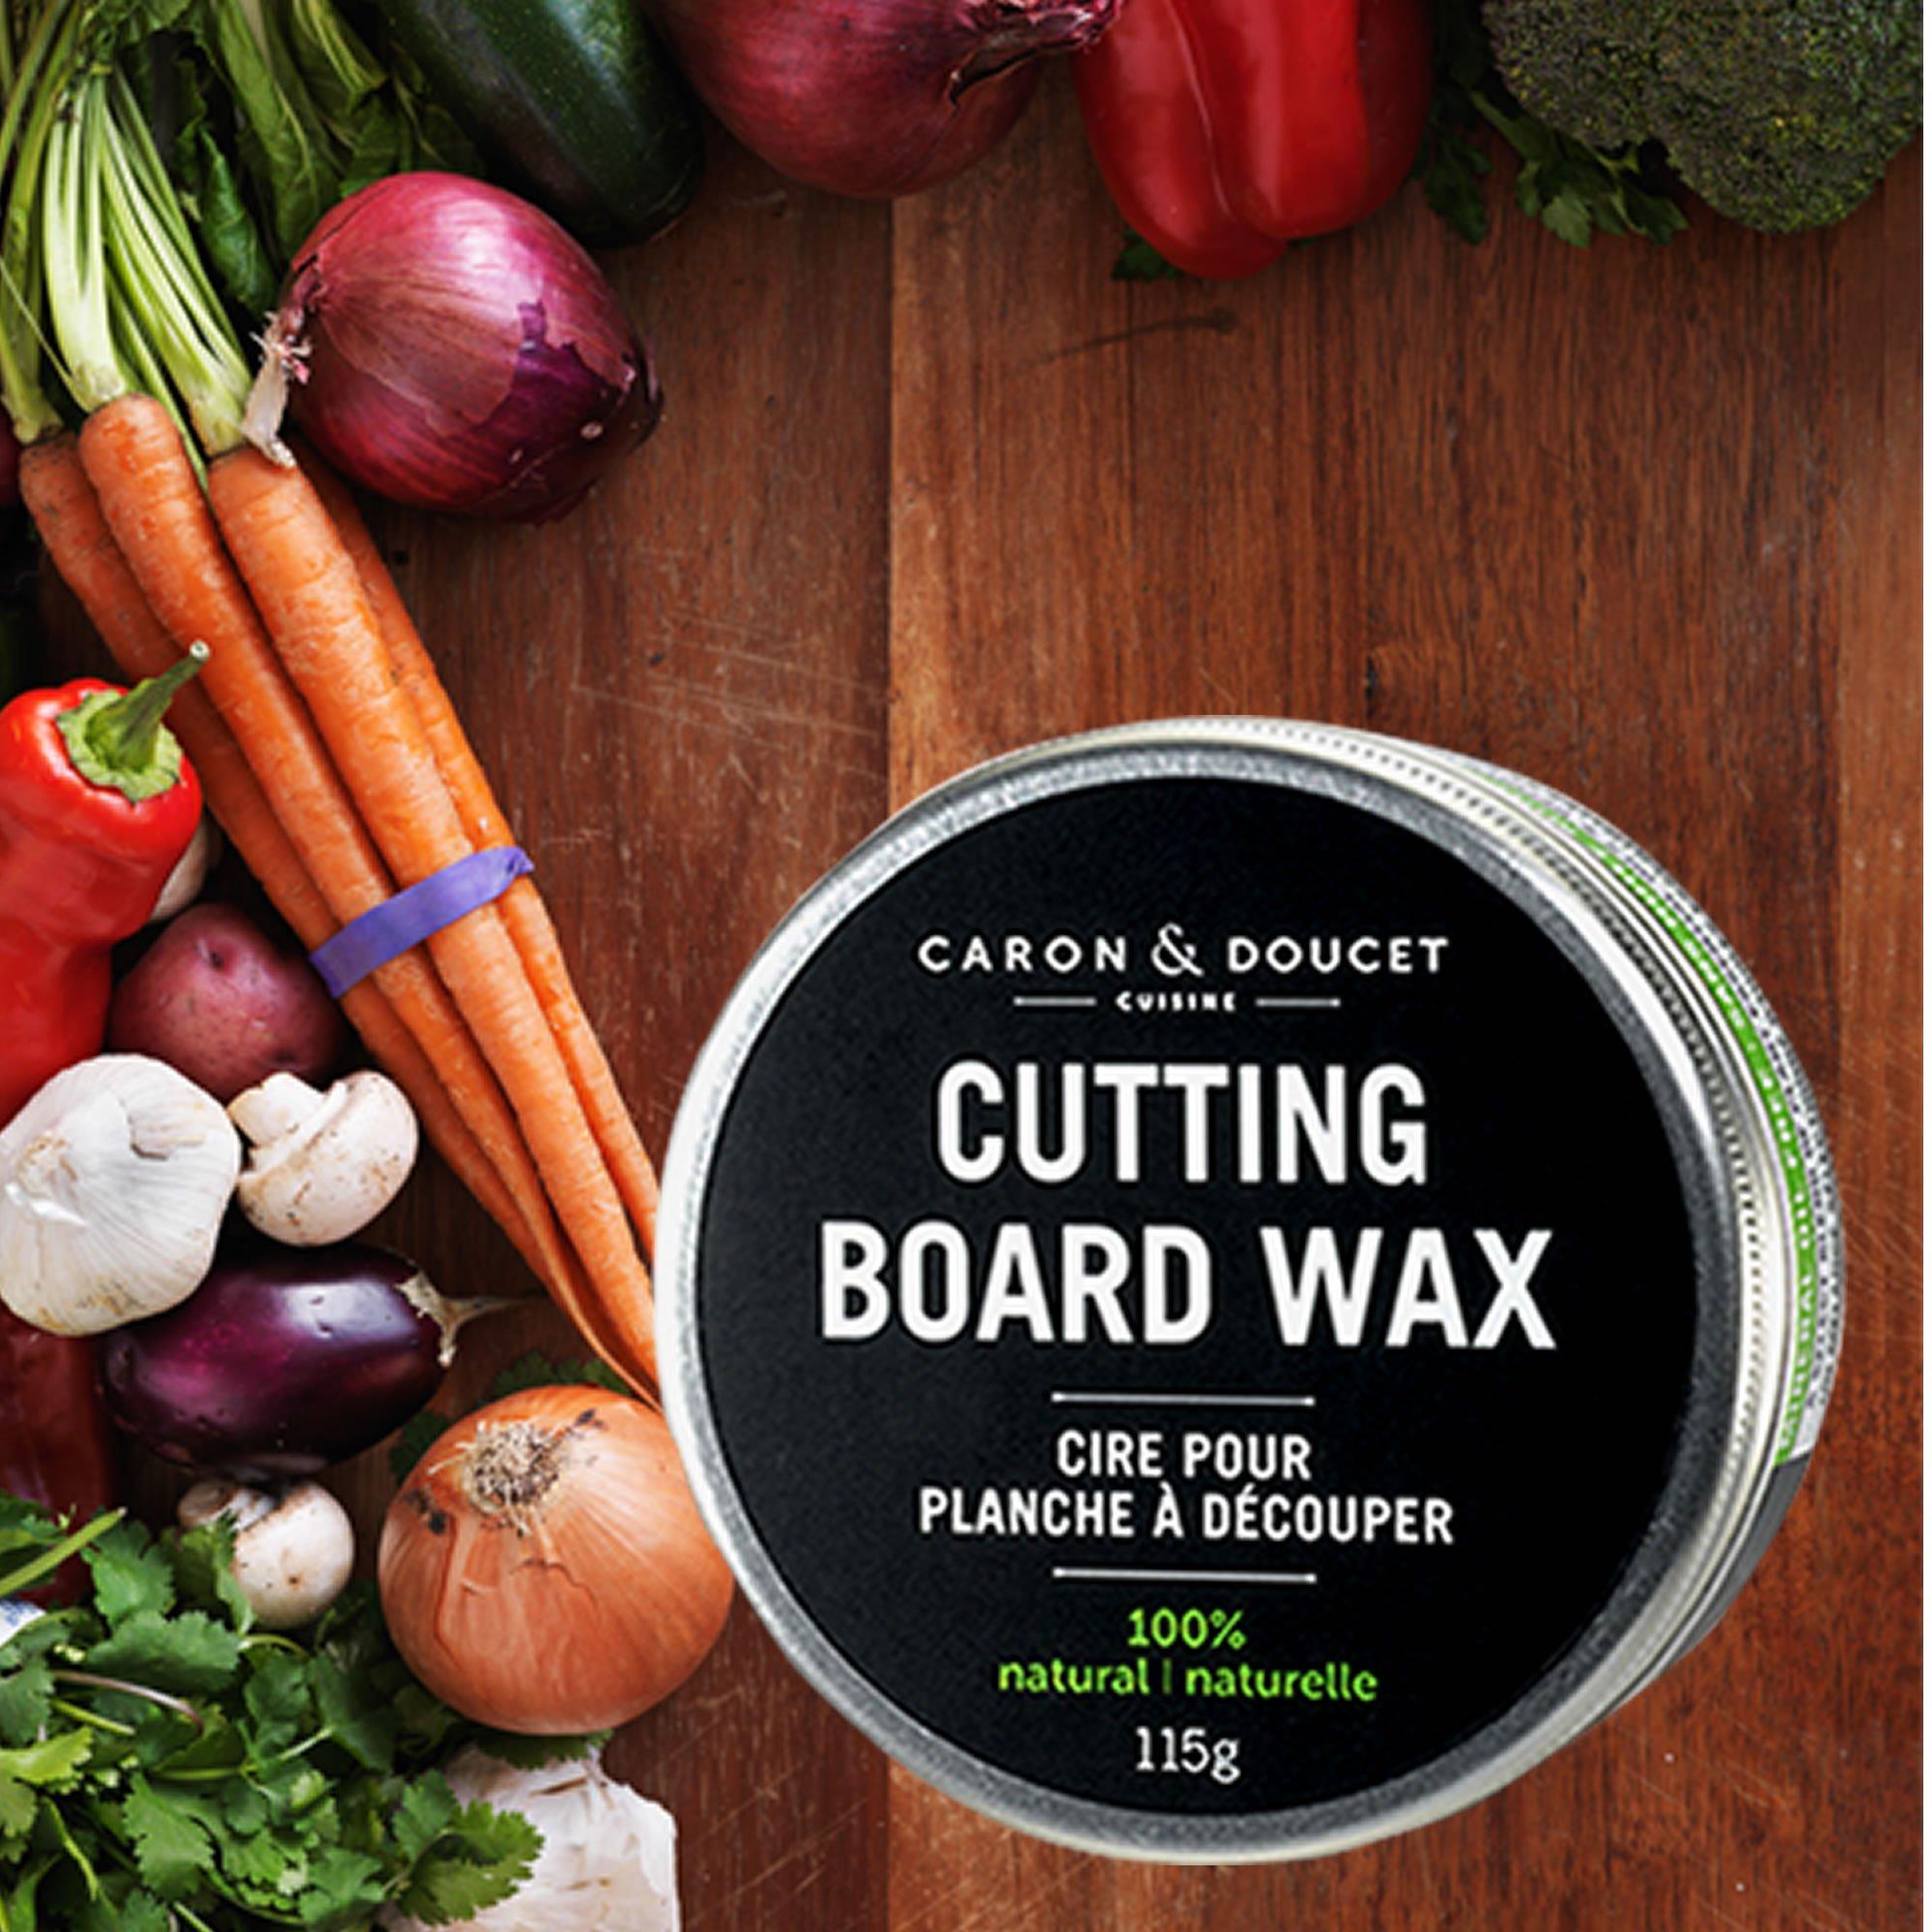 Caron & Doucet - Cutting Board & Butcher Block Bundle: 2 items - 1 Cutting Board & Butcher Block Oil, 1 Cutting Board & Butcher Block Wax. 100% Plant Based (8oz Bullet) by Caron Doucet Cuisine (Image #3)